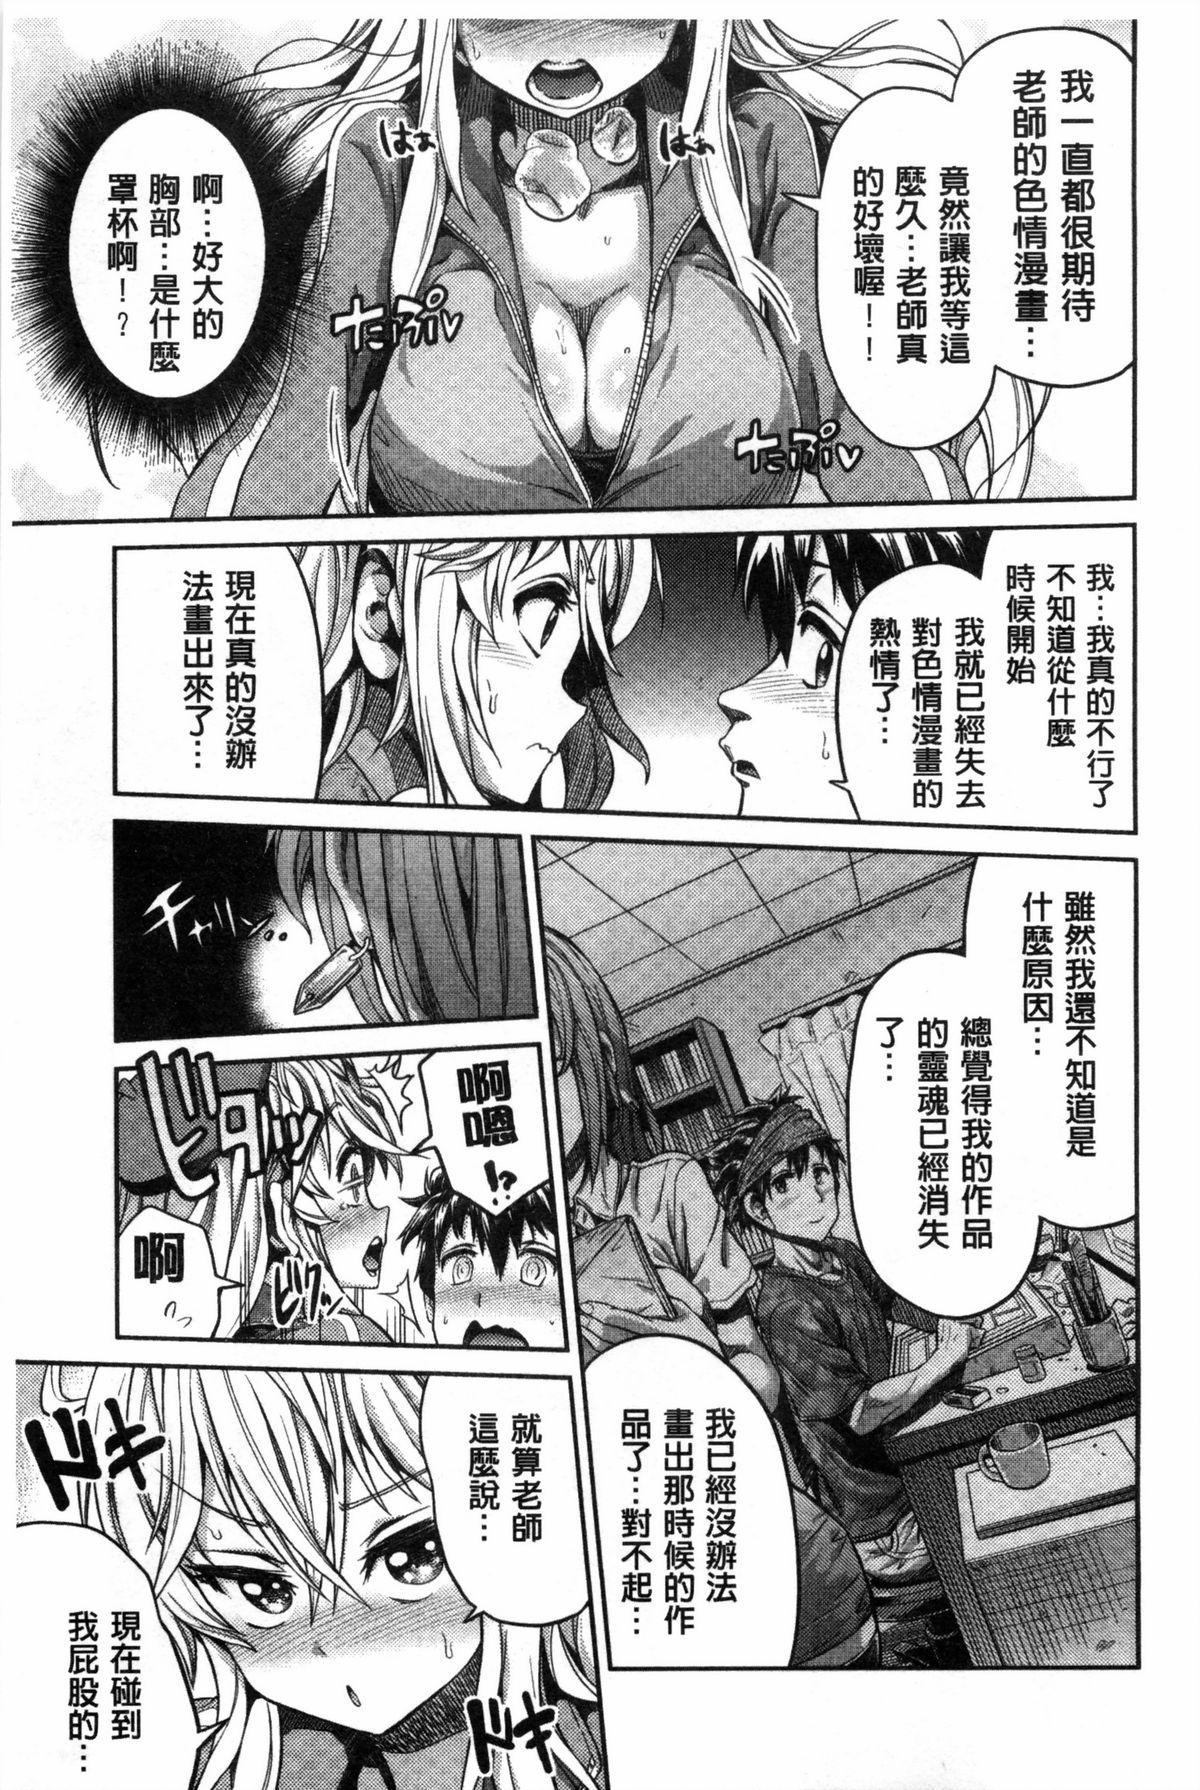 Man x Koi - Ero Manga de Hajimaru Koi no Plot   A漫×戀情 由情色漫畫所萌生的戀之物語 15